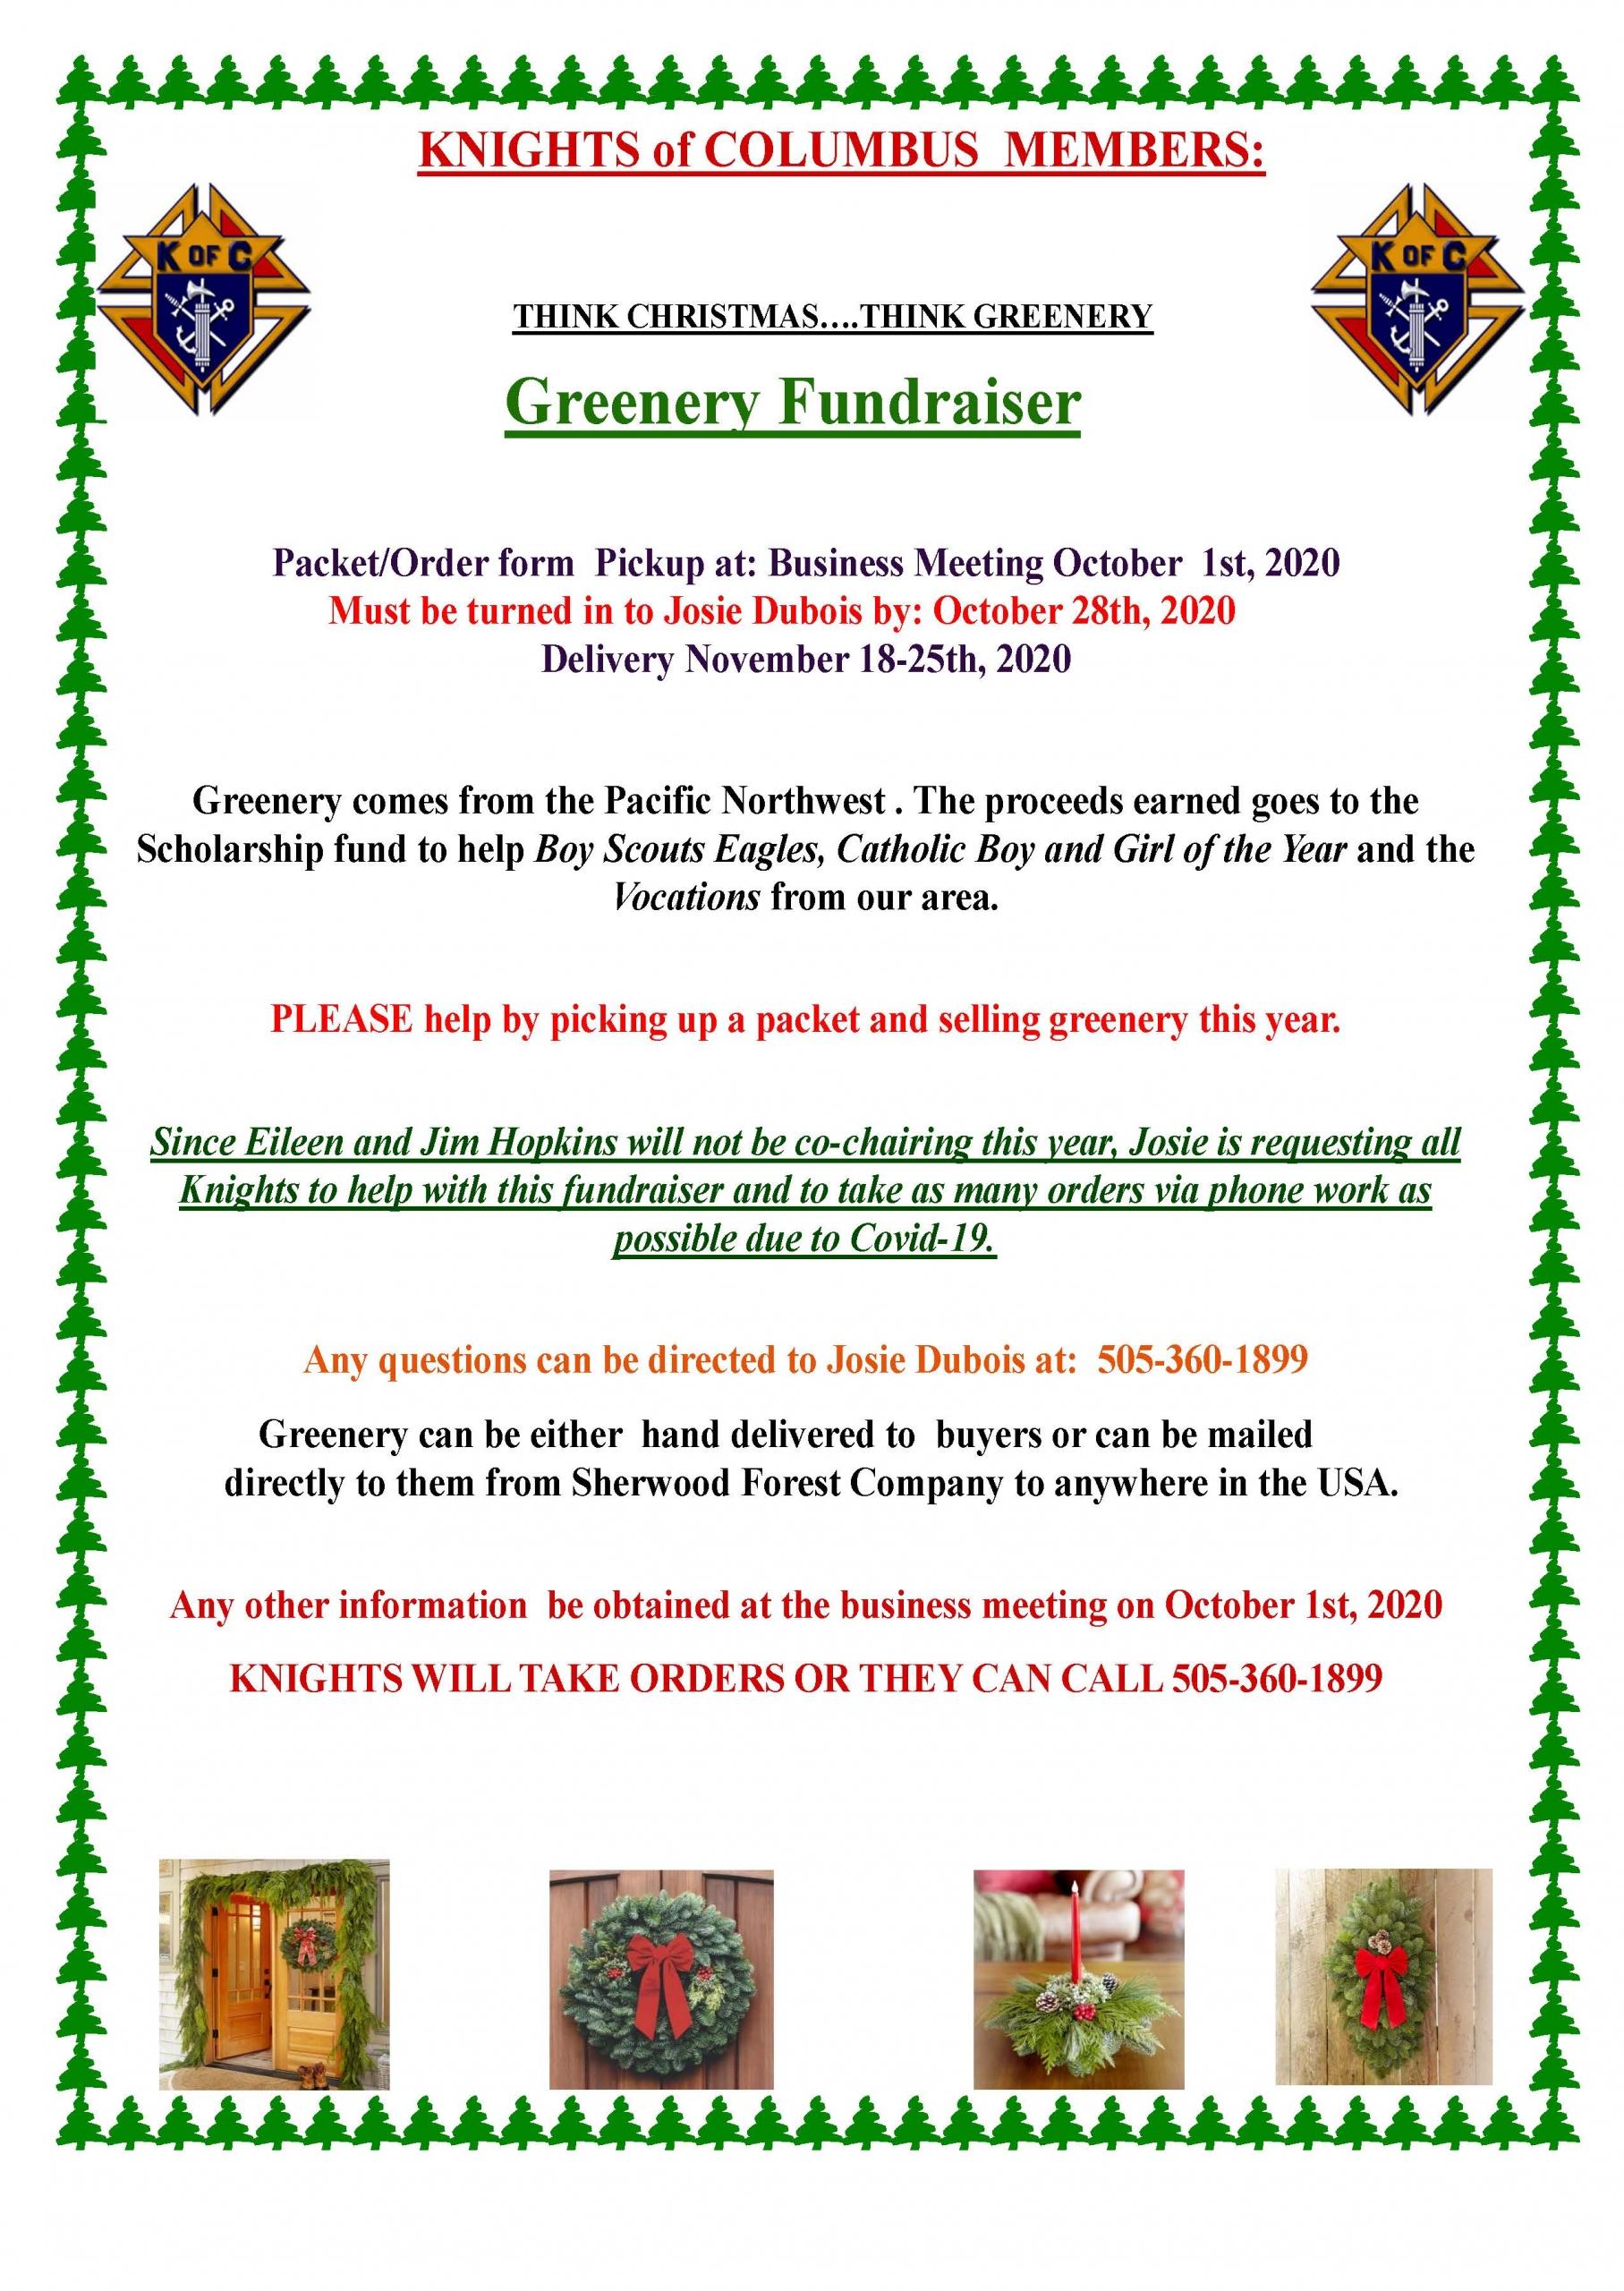 Greenery Fundraiser